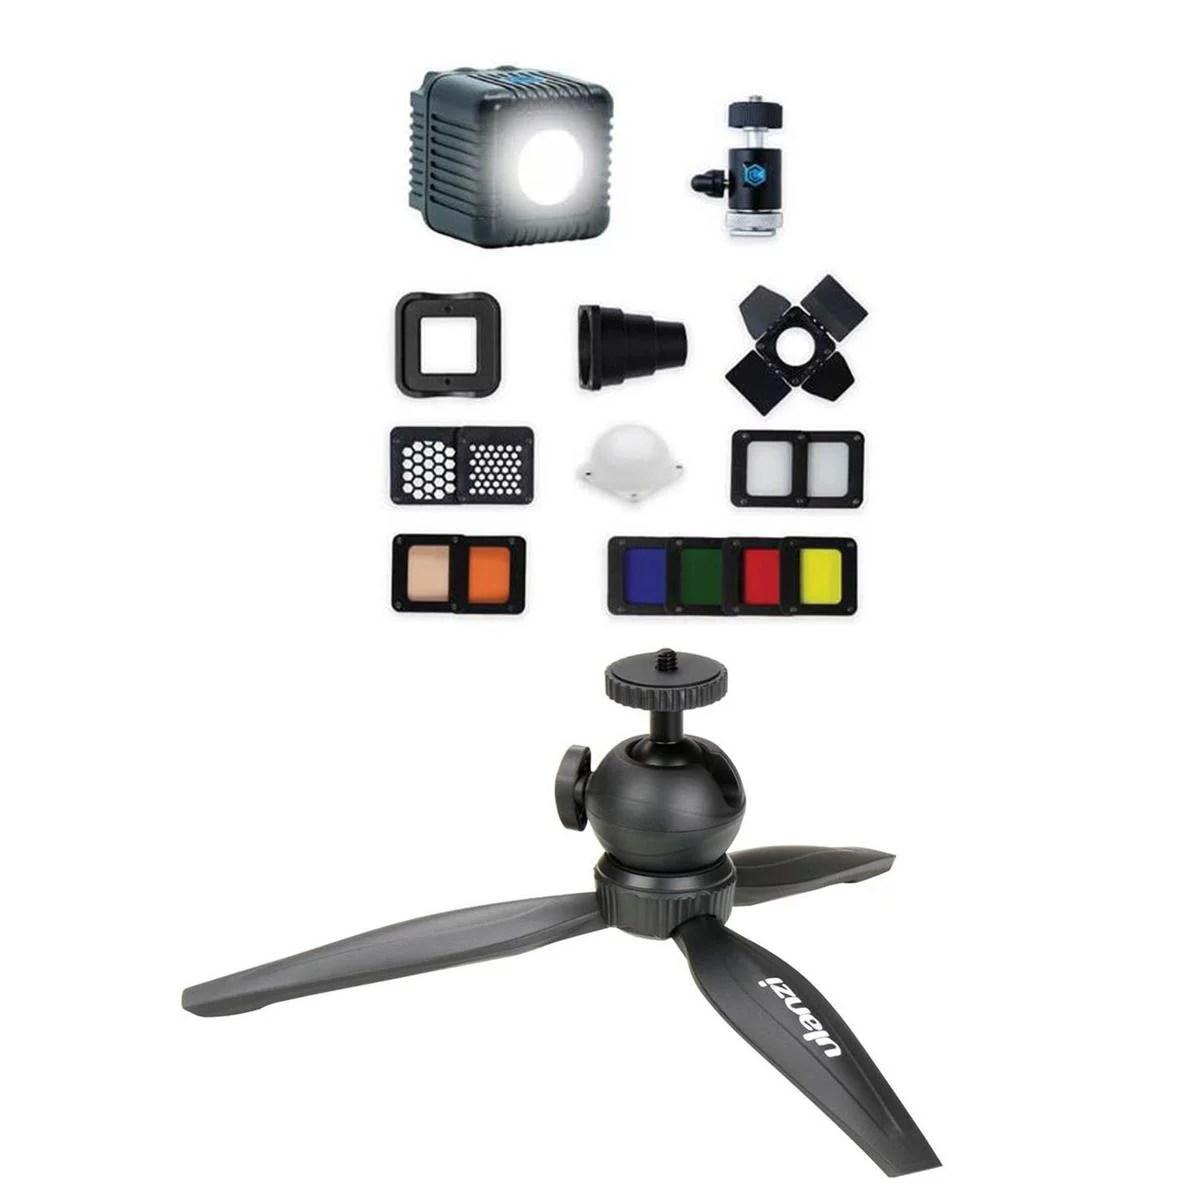 lume cube 2 0 portable lighting kit plus bundle includes lume cube 2 0 daylight led light dslr camera mount with light stand adapter with ulanzi m